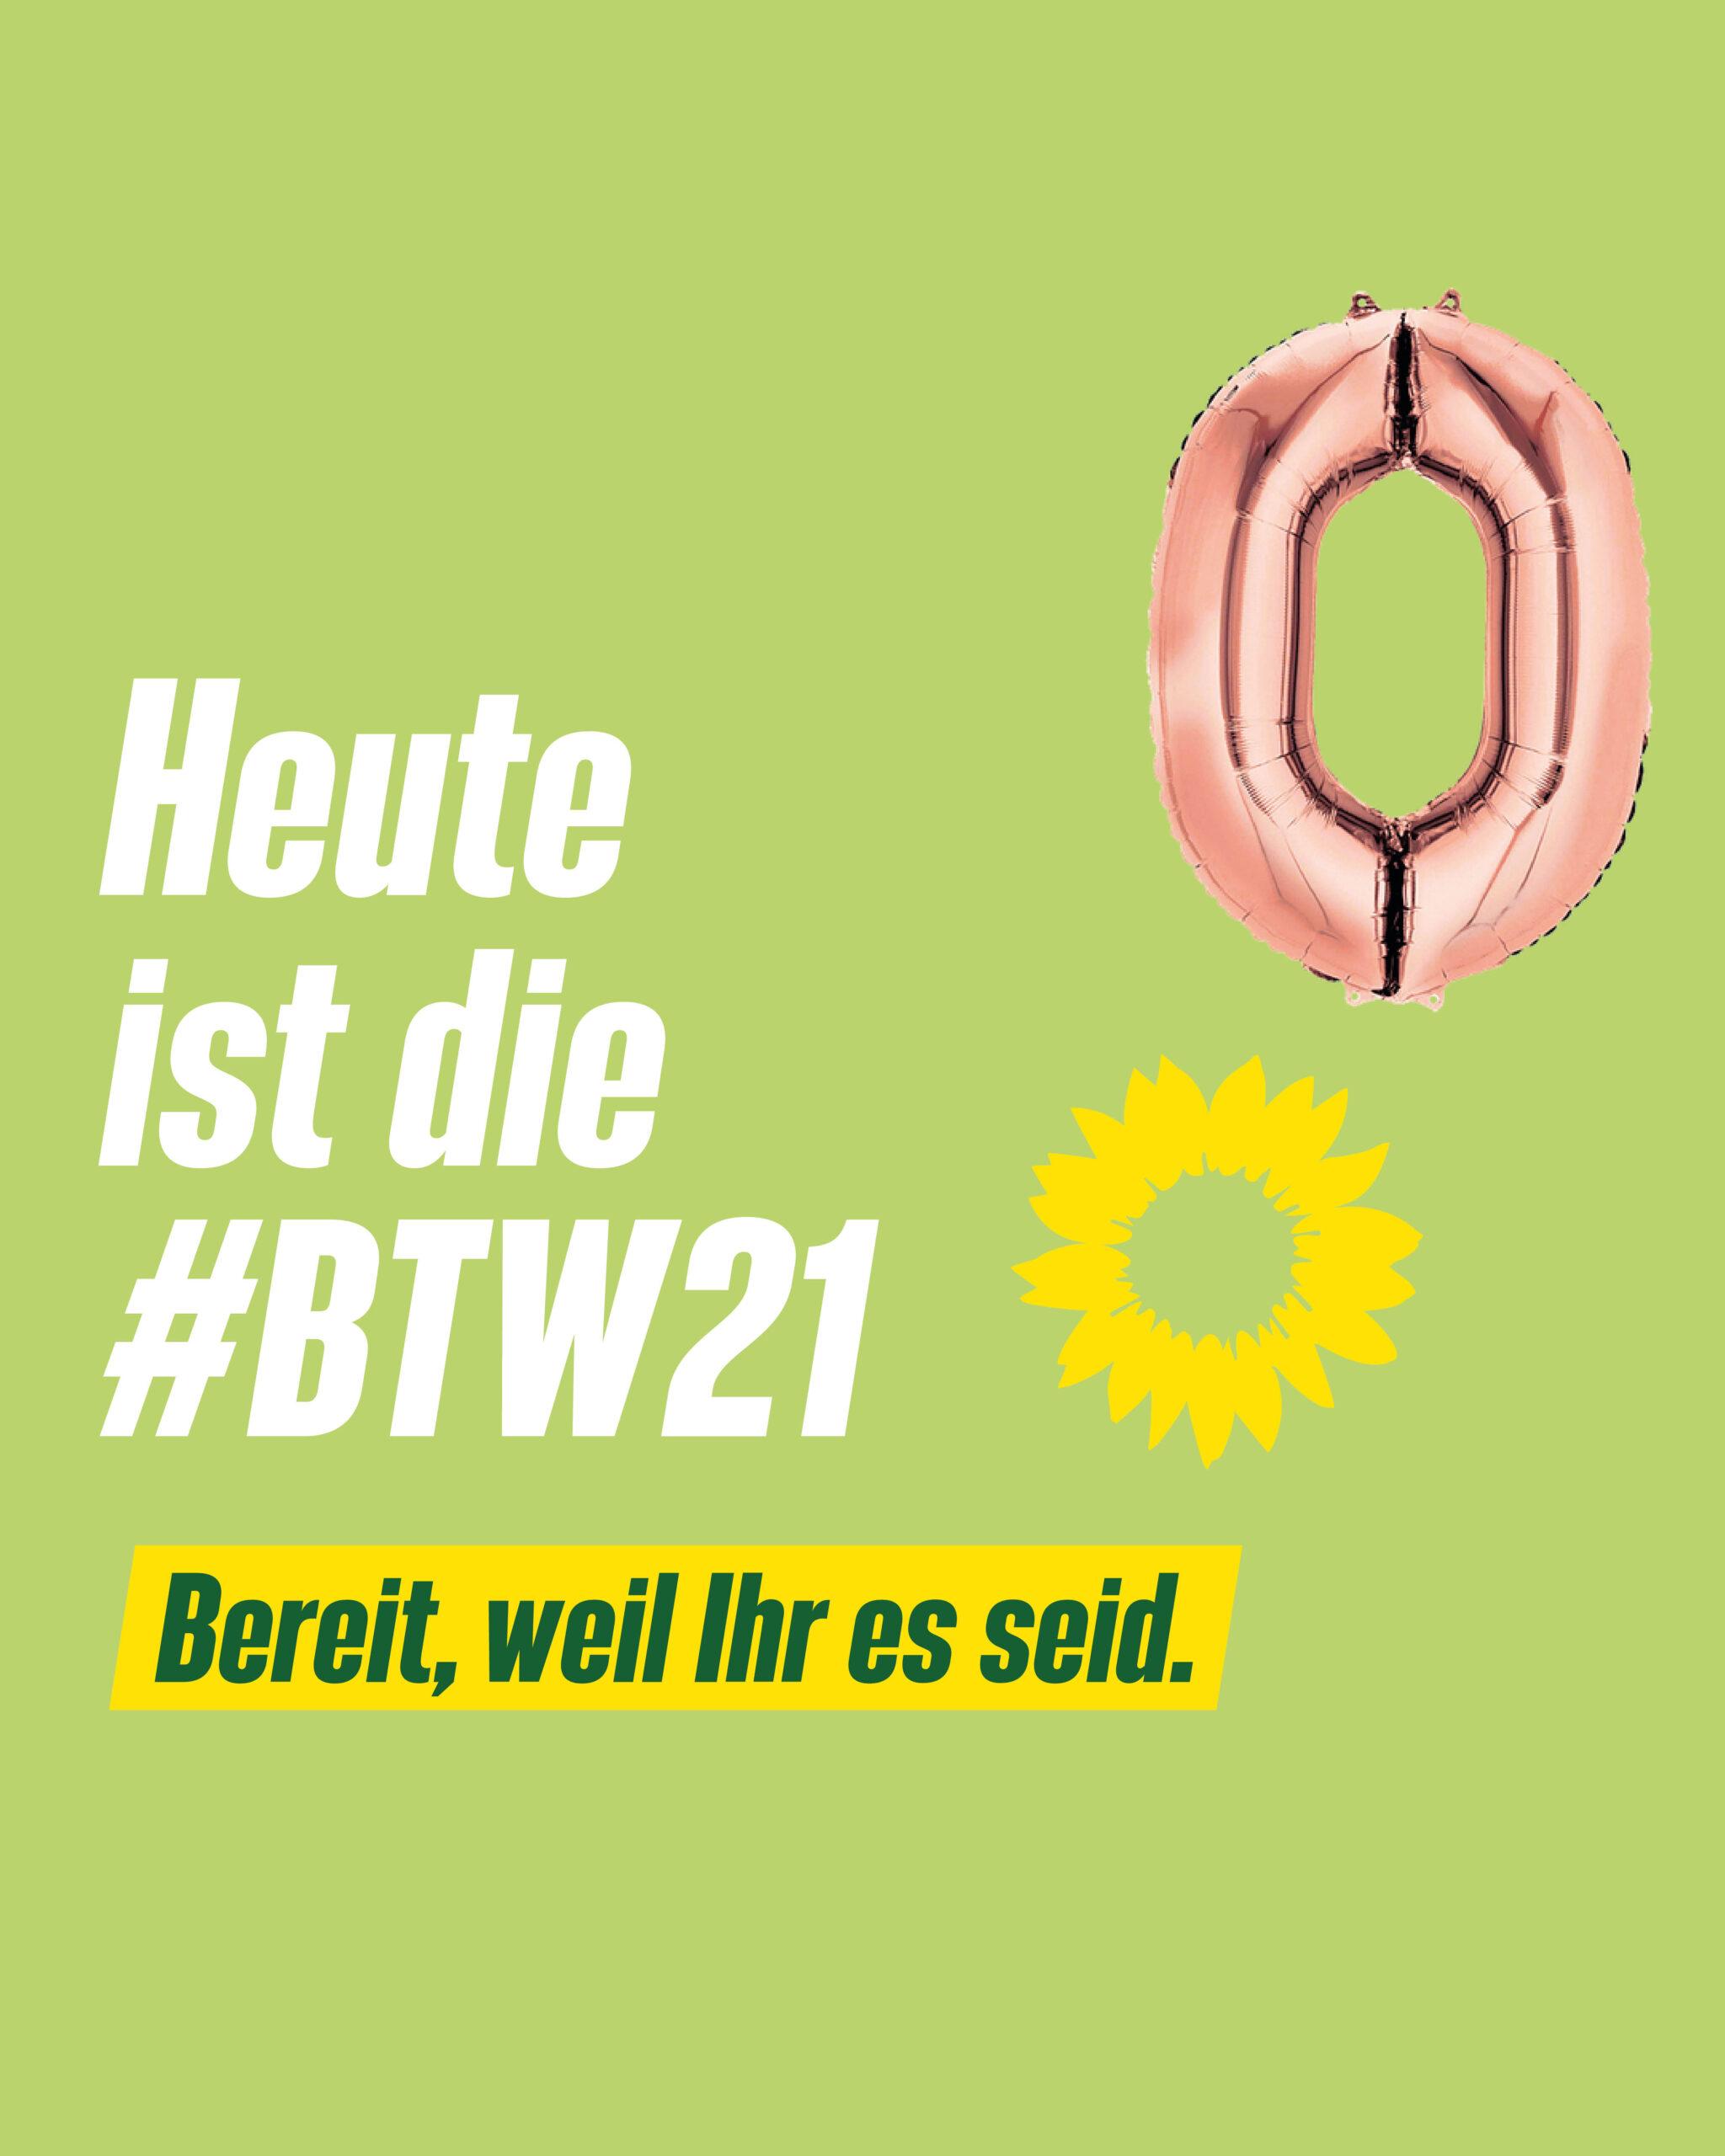 Heute ist Bundestagswahl